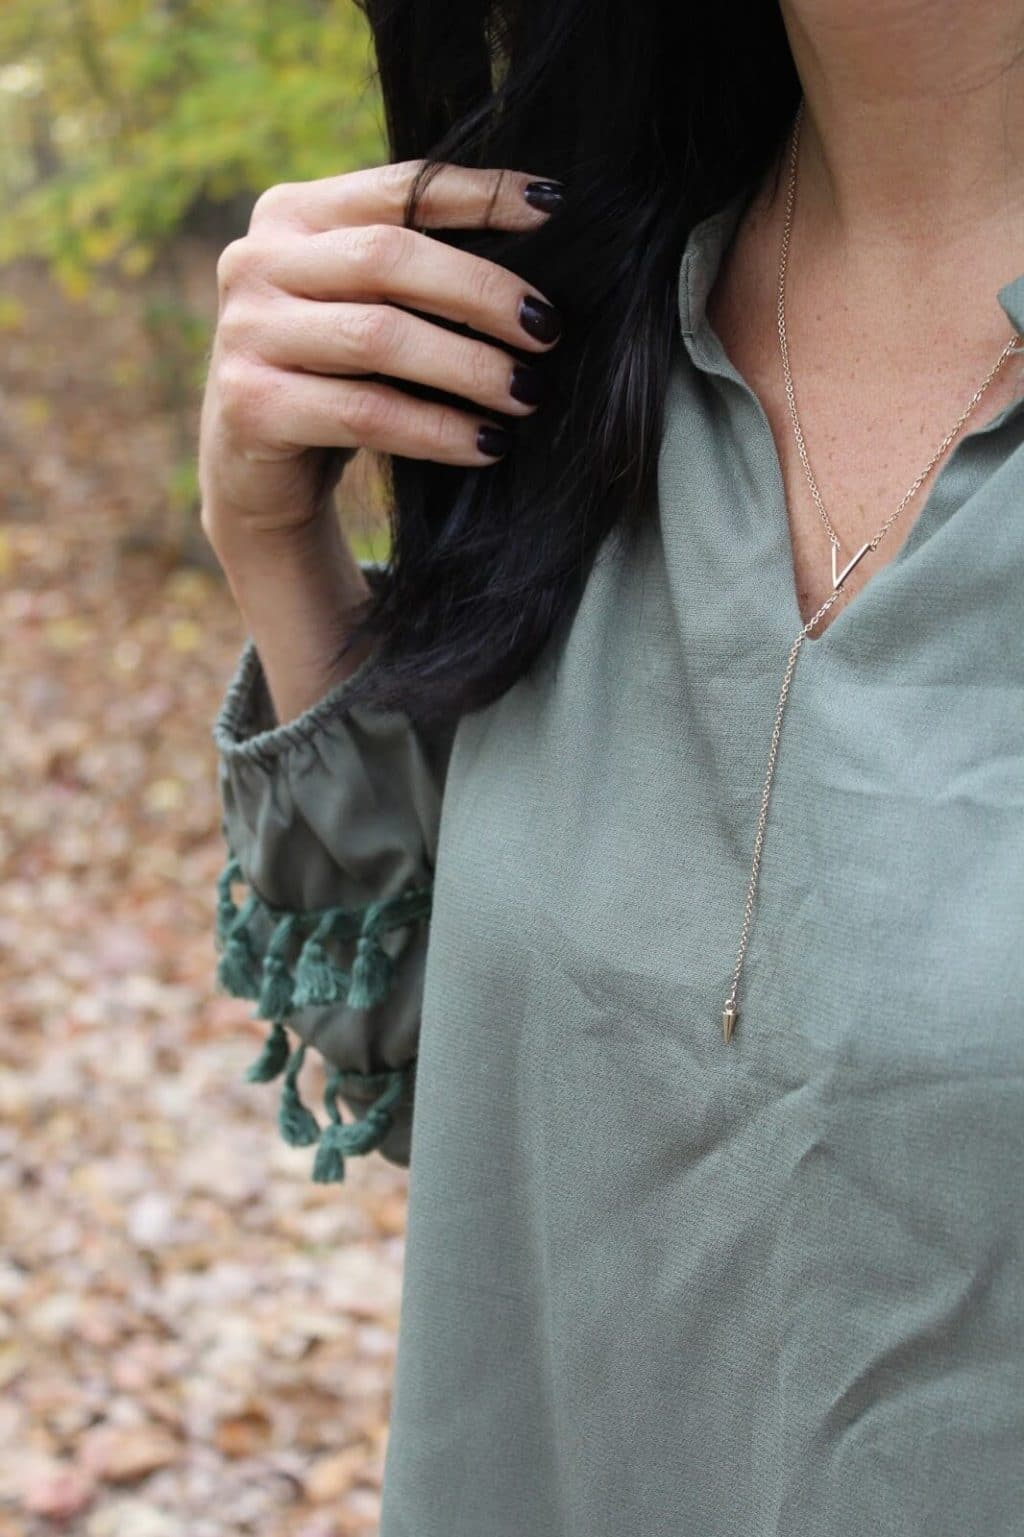 Tassel Blouse, lariat necklace Nordstrom